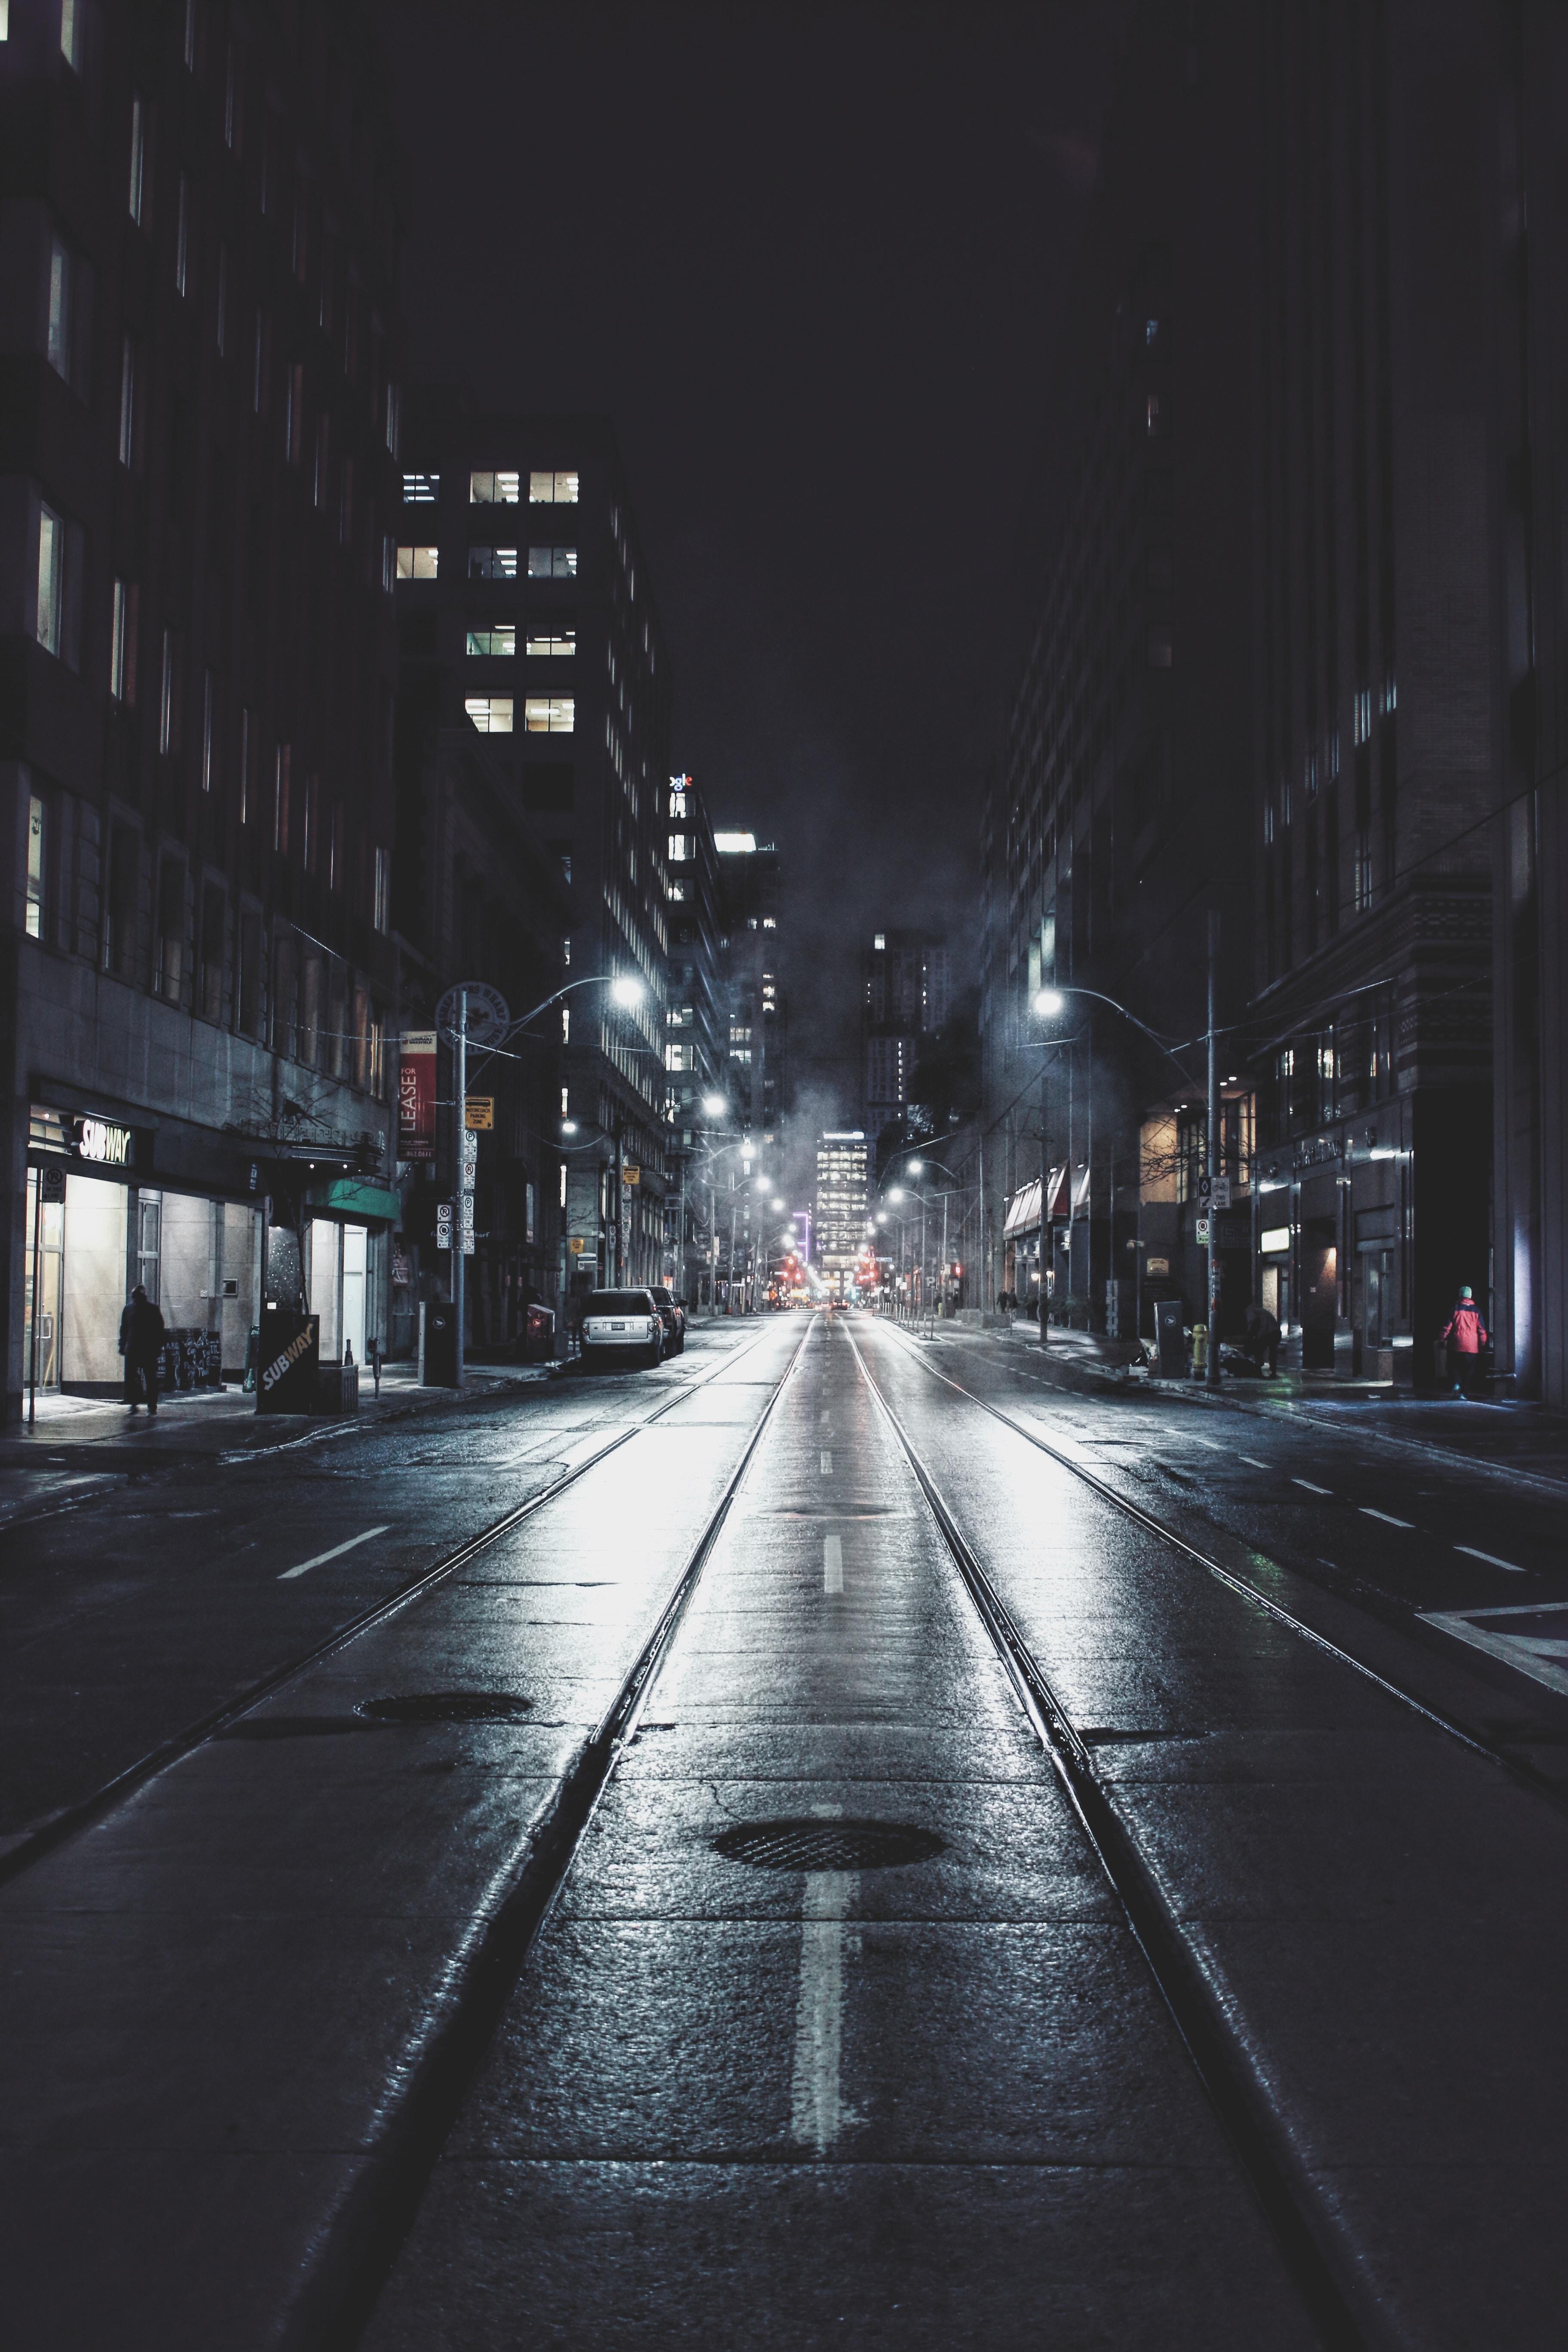 Street views on a dark rainy night in downtown Toronto